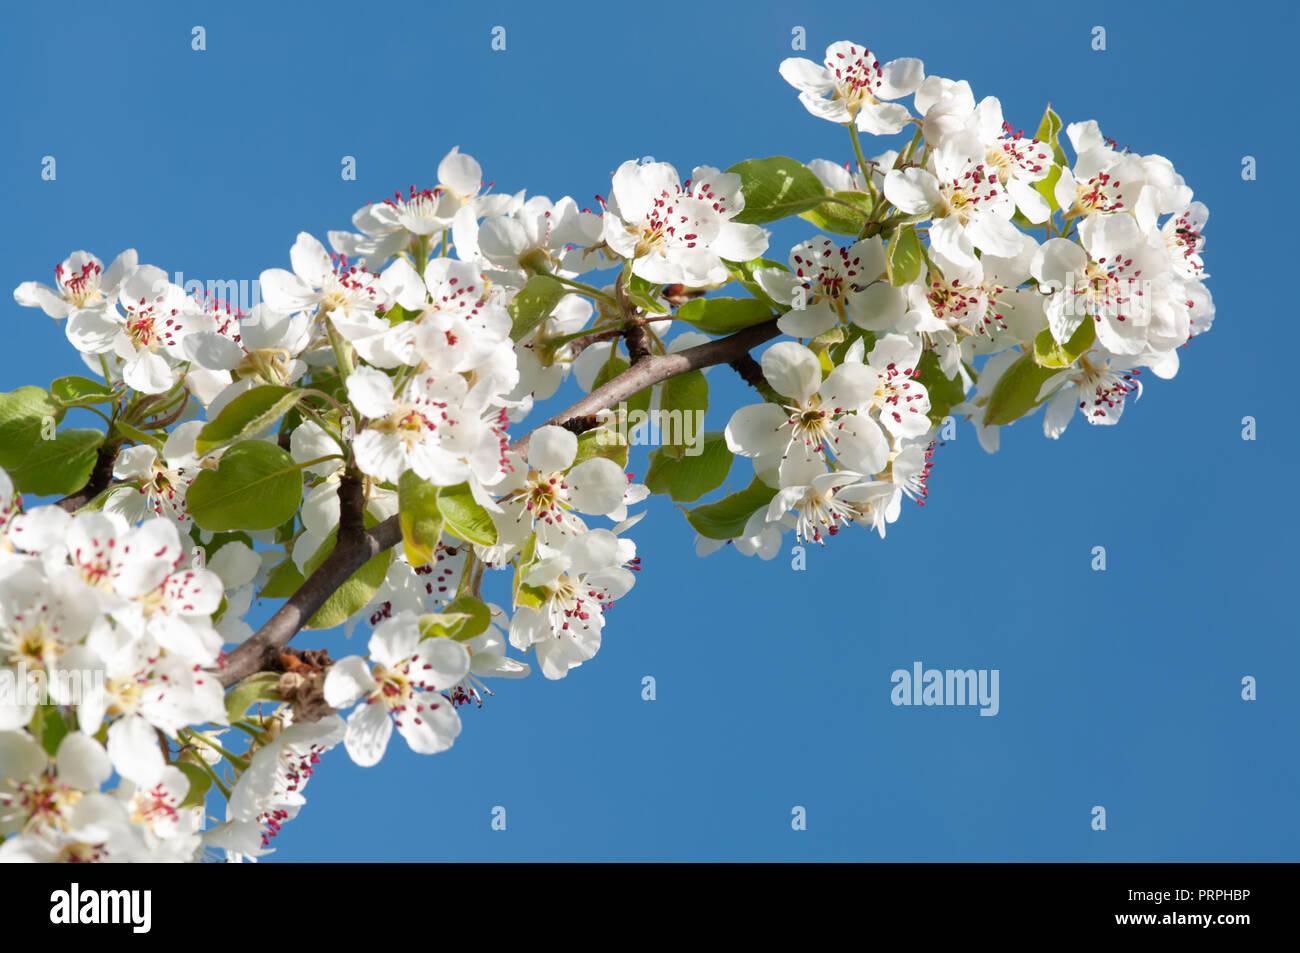 Cherry tree flowers - Stock Image